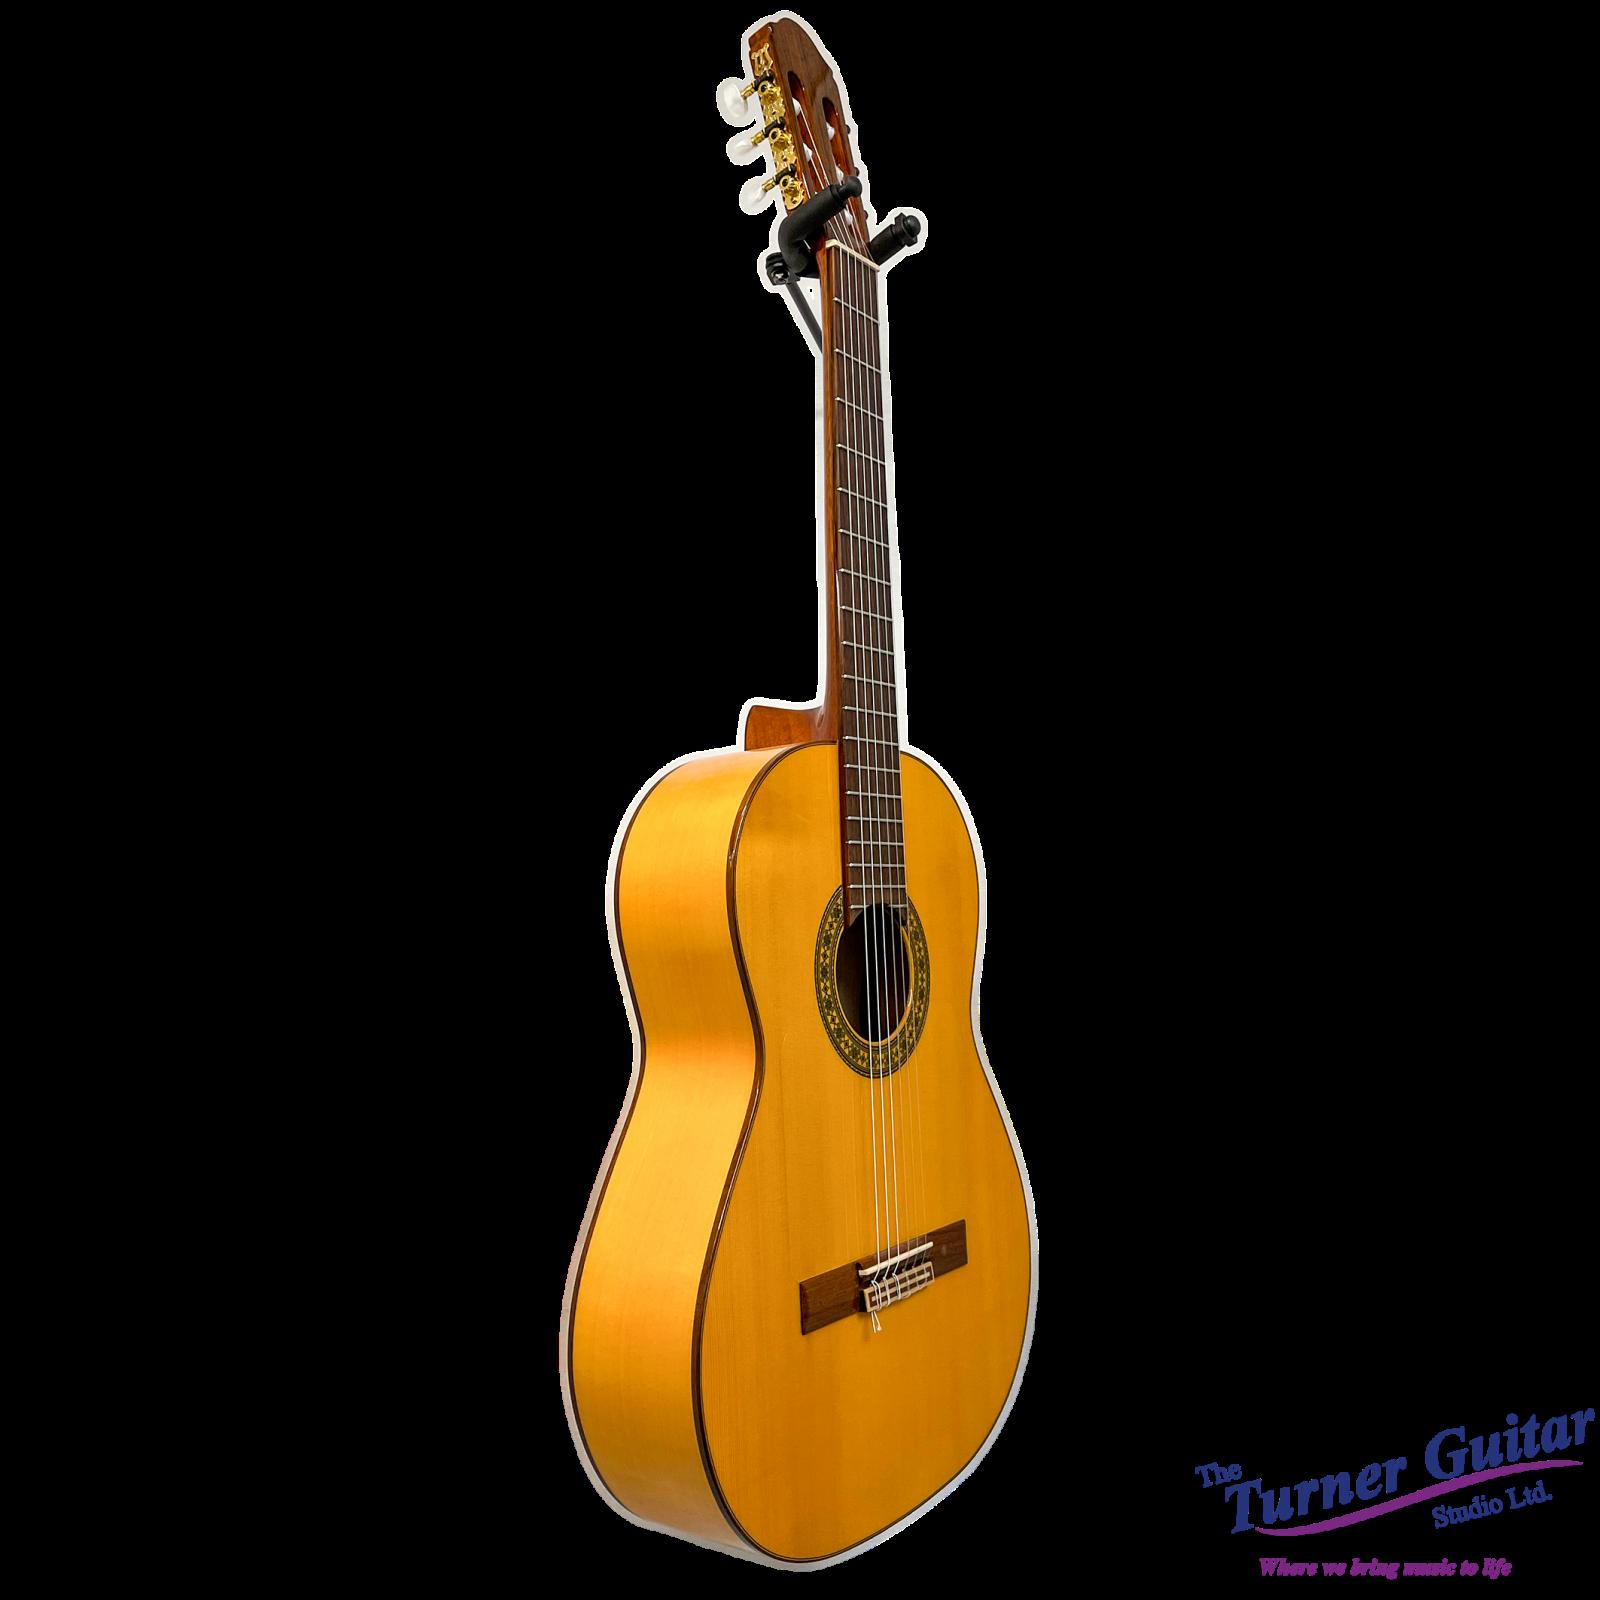 Raimundo Spanish Built Classical Guitar - Some Cosmetic Damage